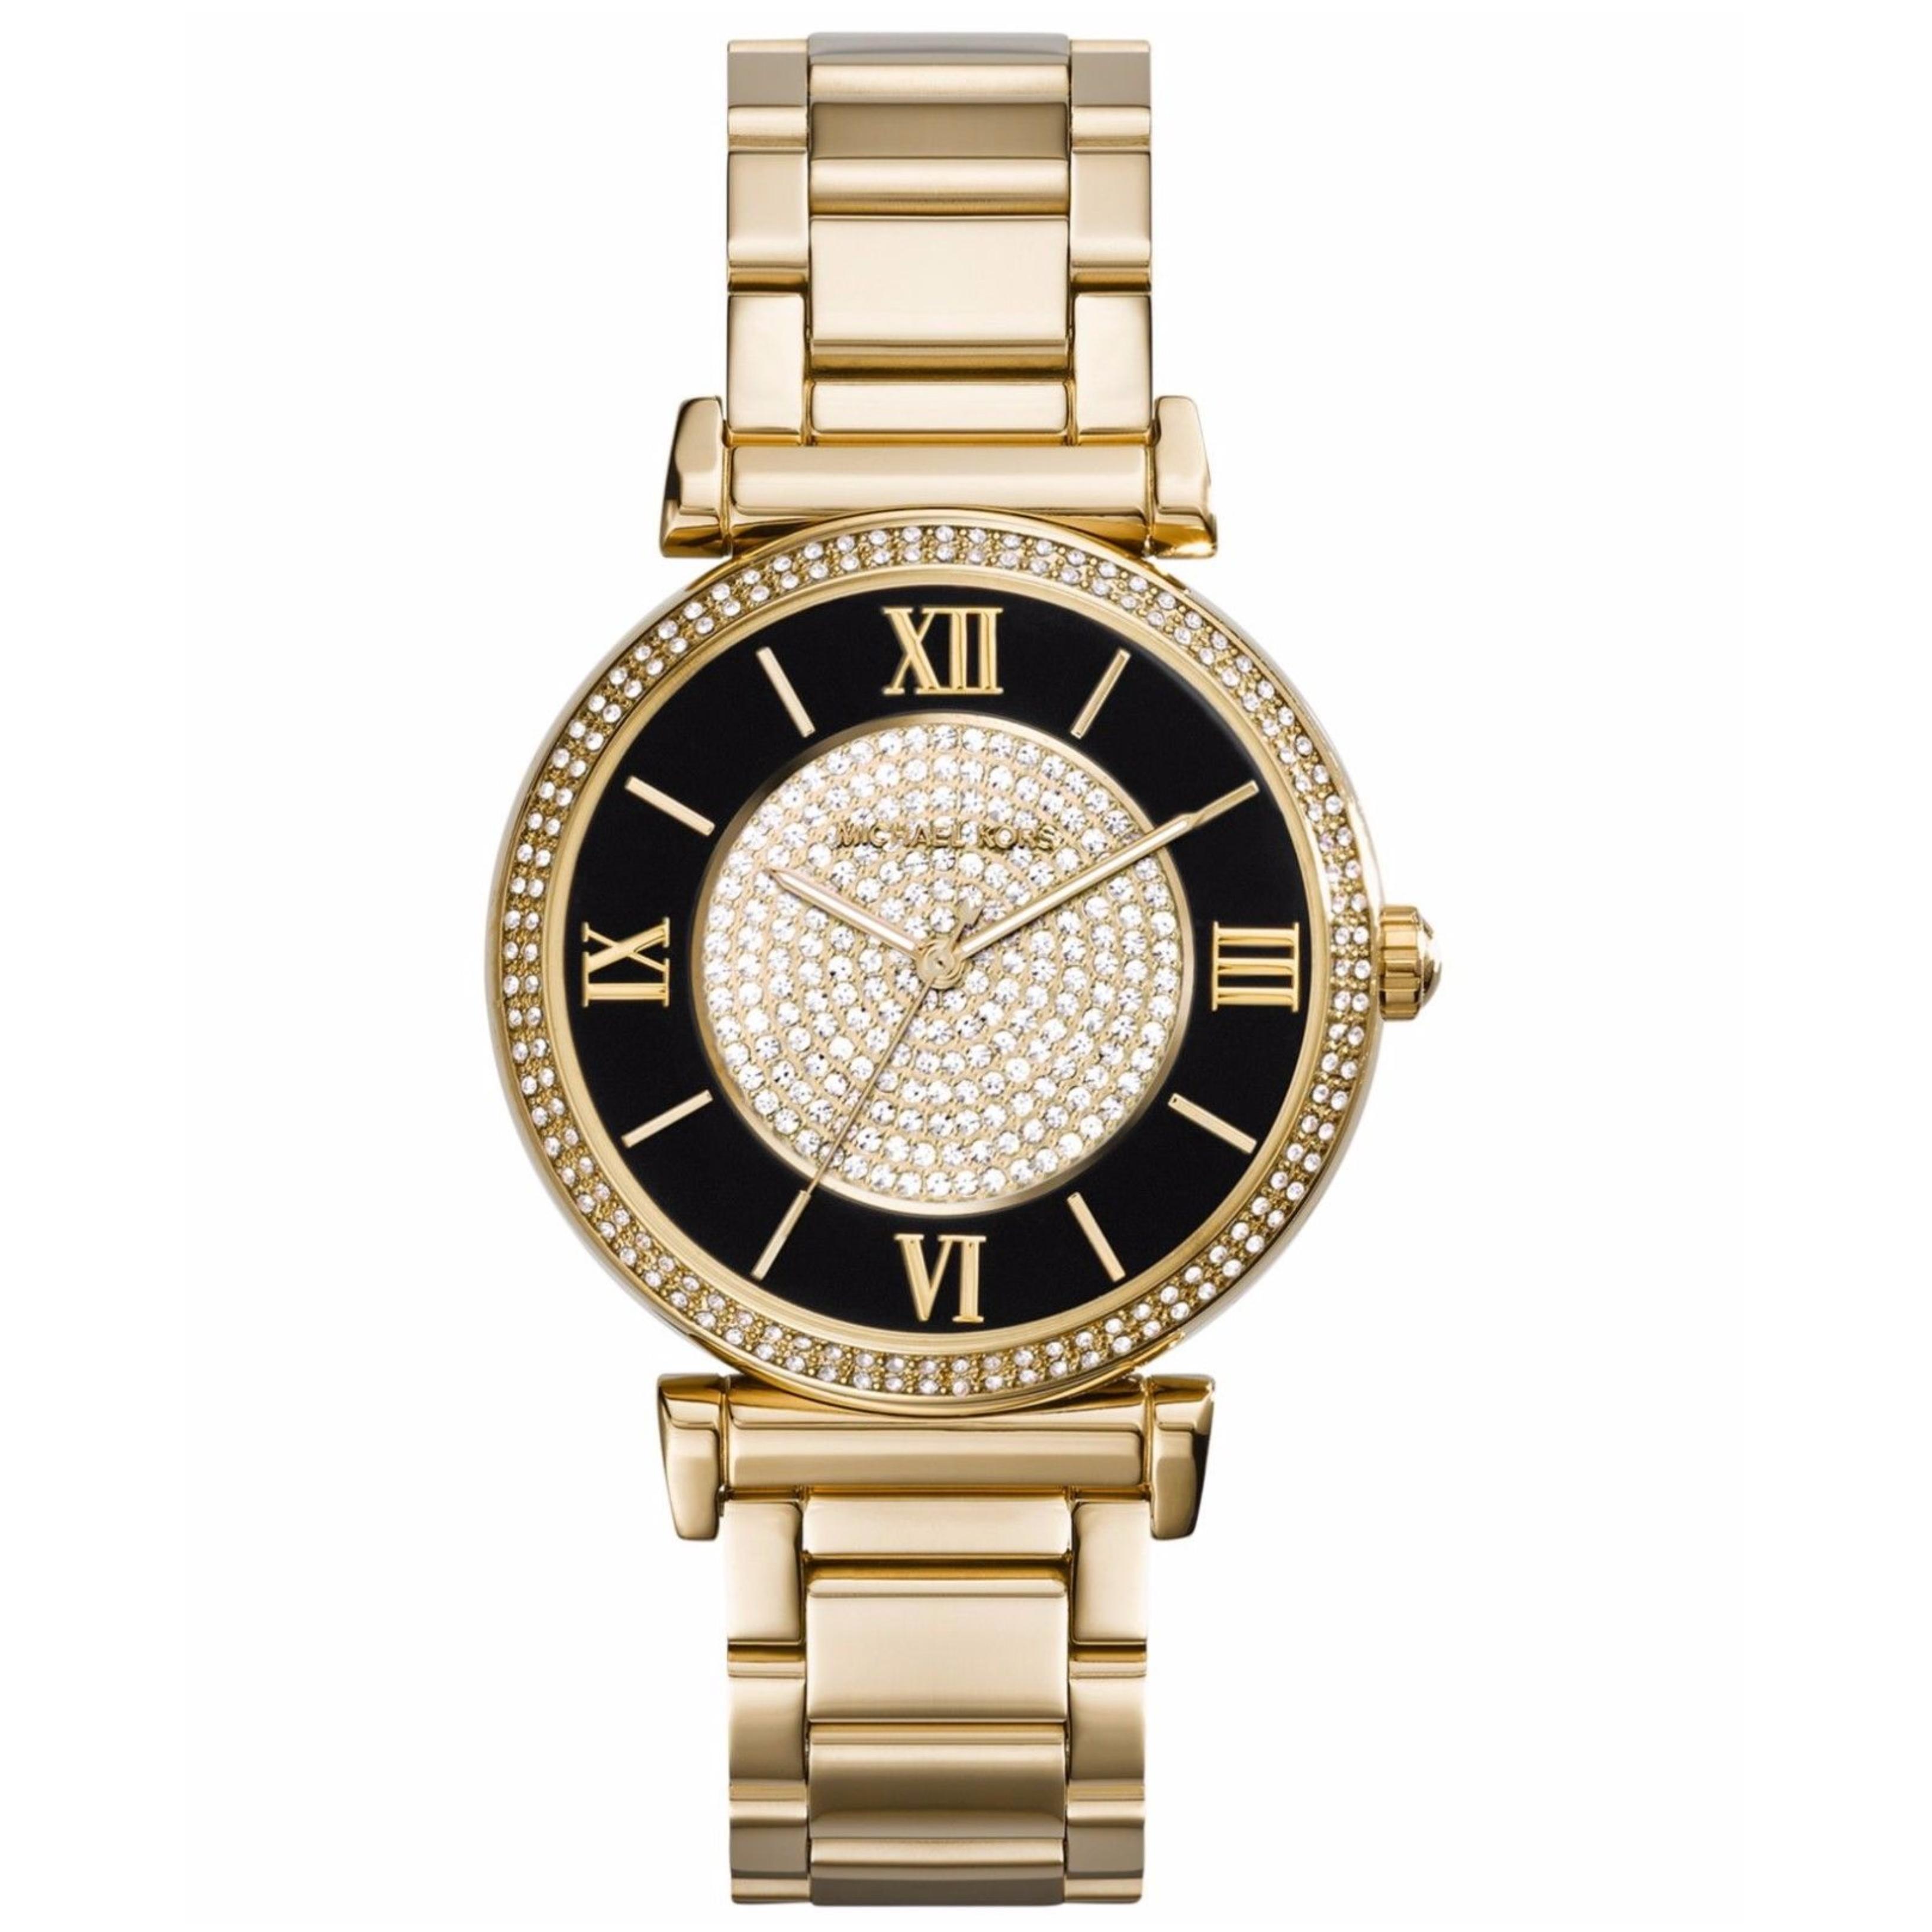 ecb7b85fb5d5 Michael Kors Catlin Collection Gold Tone Crystal Designer Ladies  Watch  MK3338